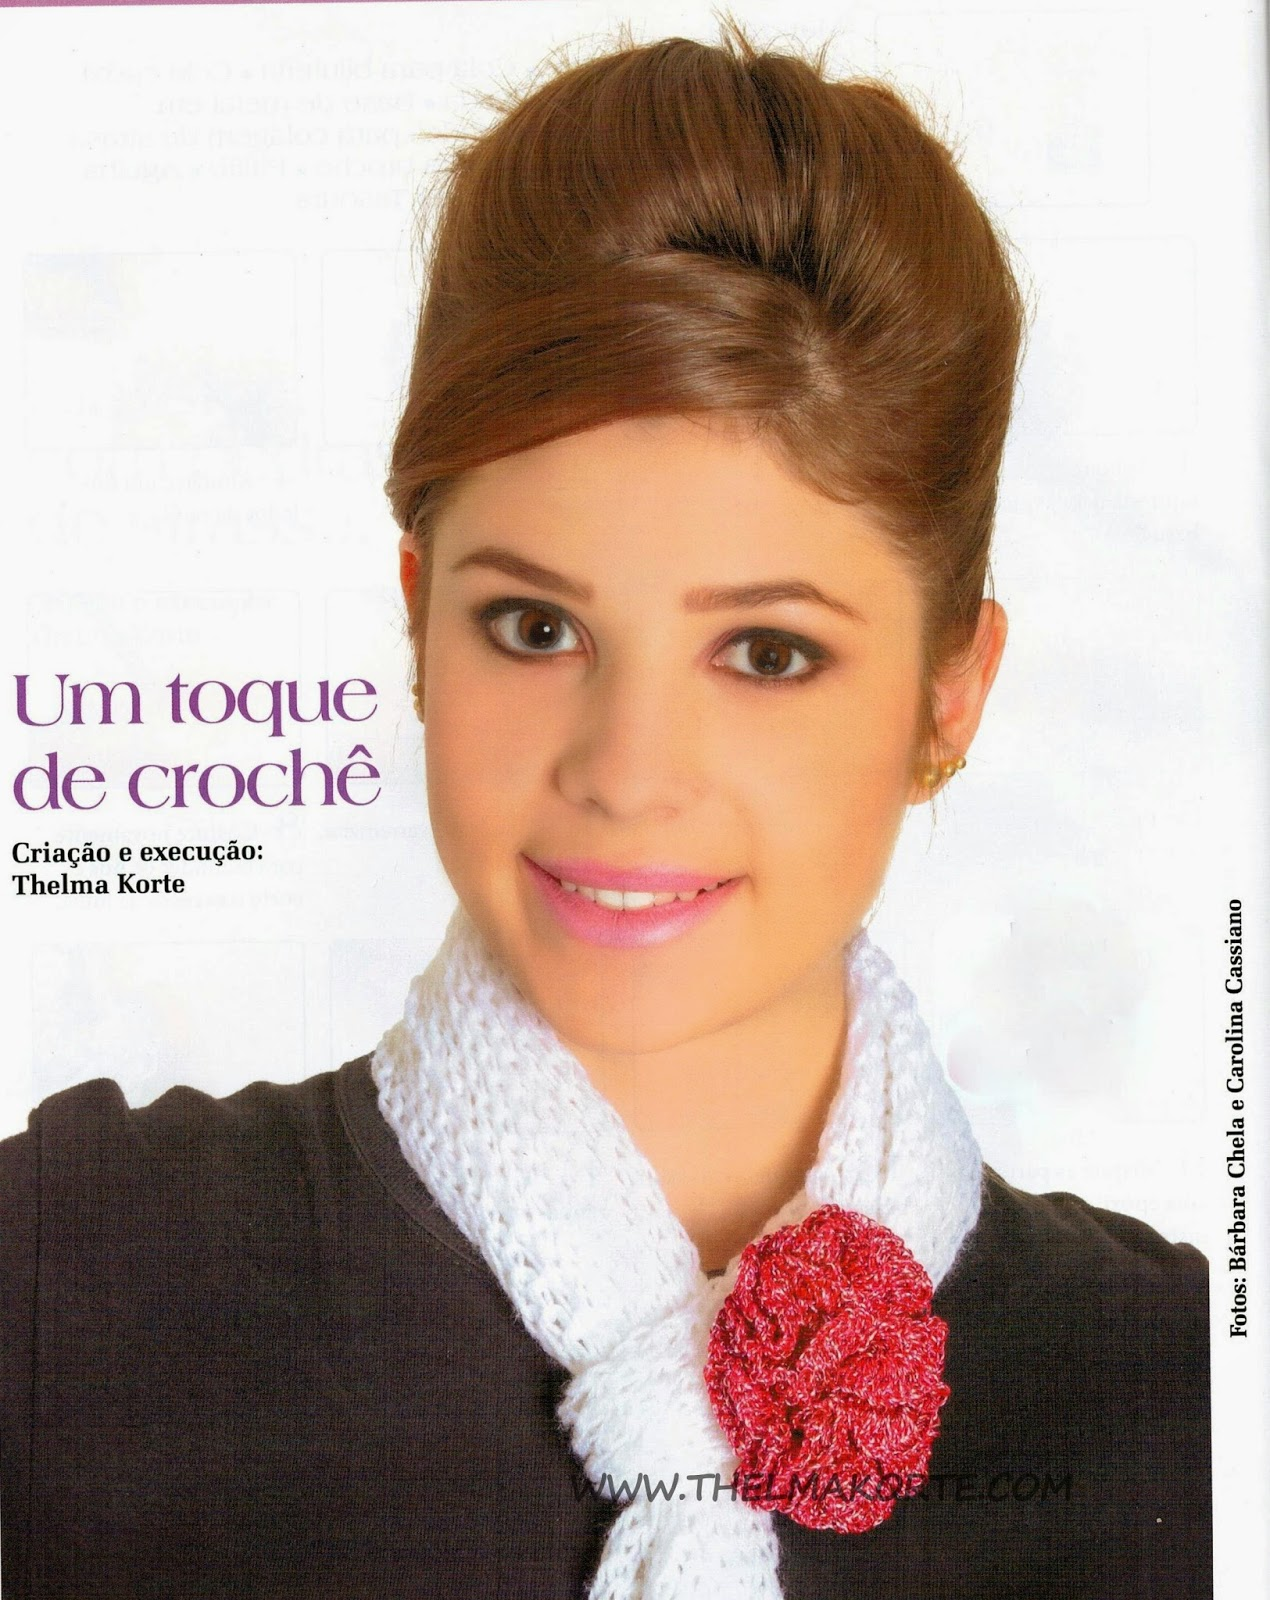 BROCHE DE FLOR DE CROCHÊ POR THELMA KORTE